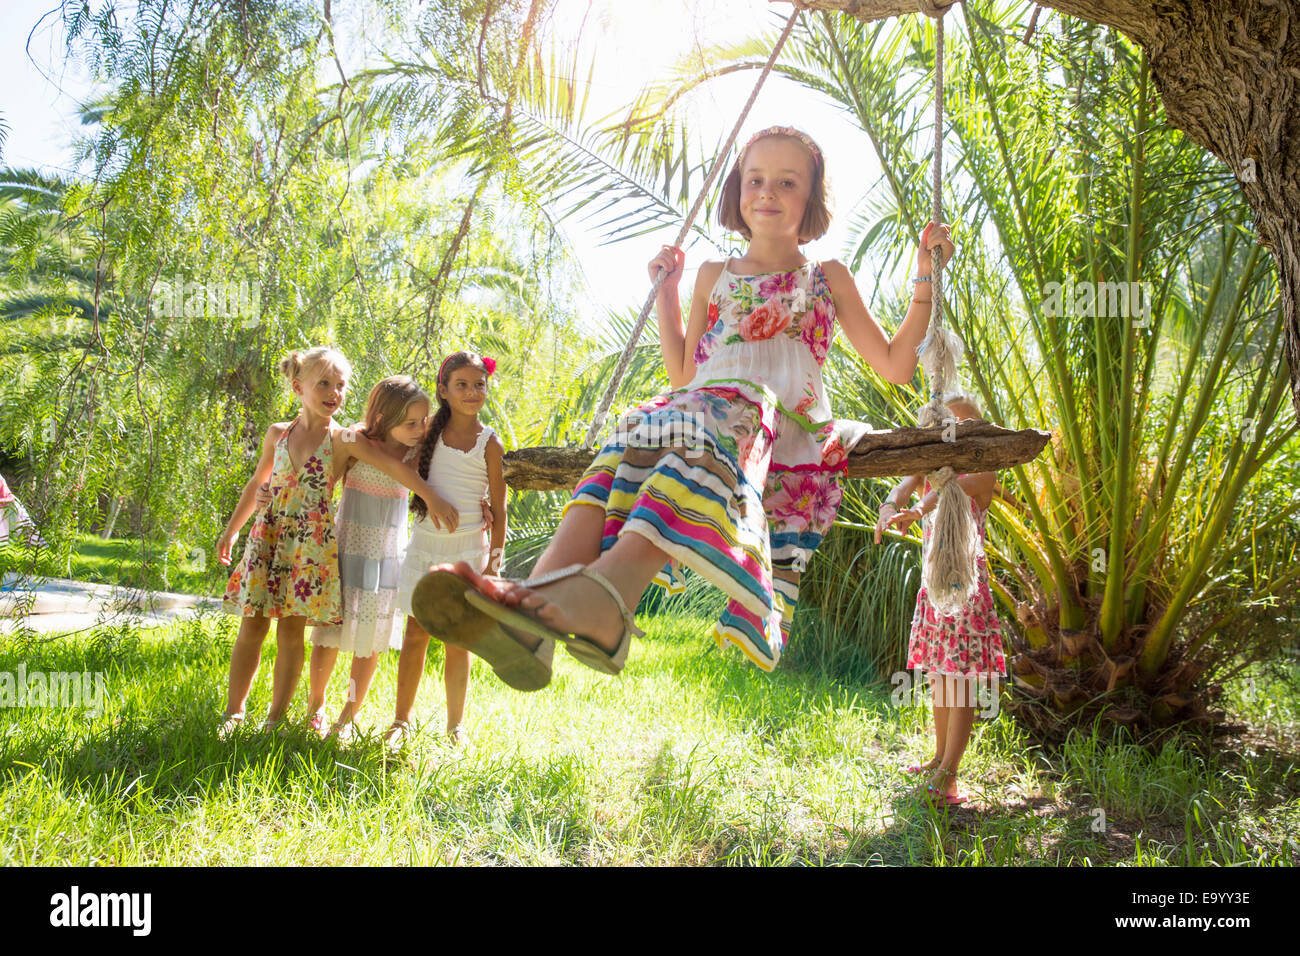 Girls queueing for tree swing in garden Stock Photo